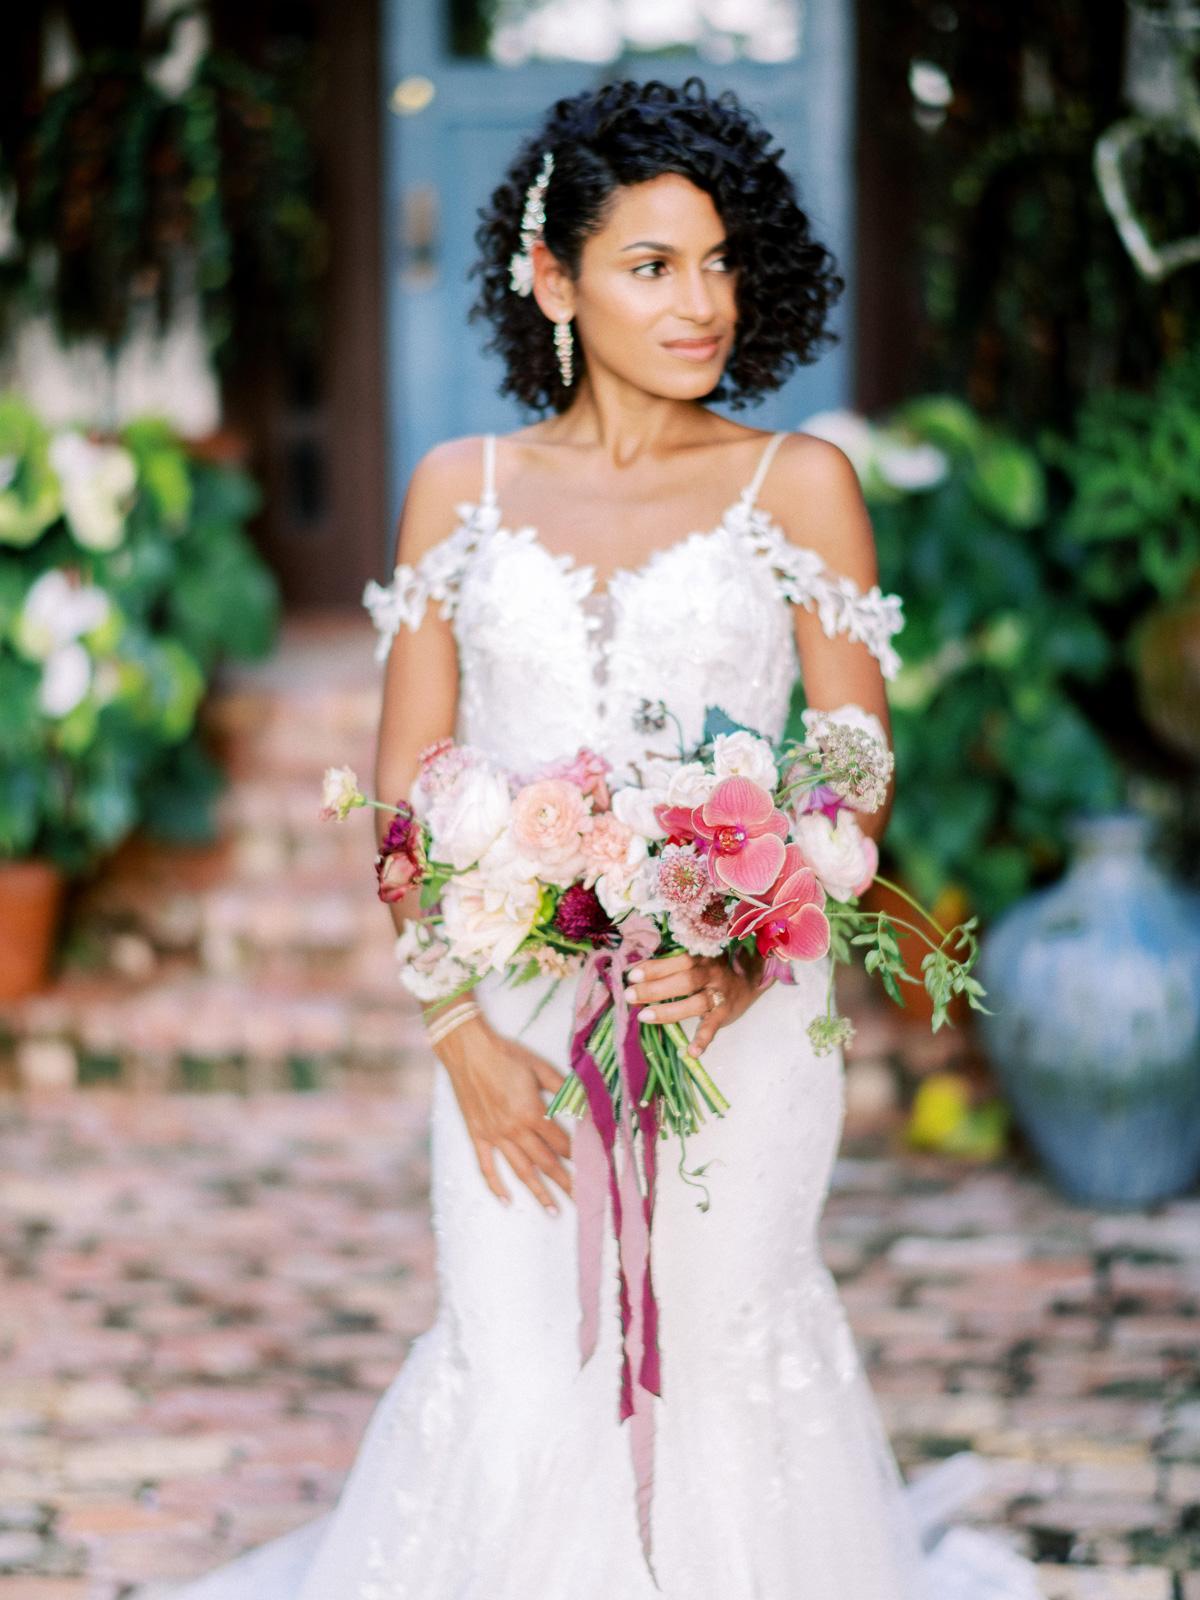 melissa lindsey wedding bride portrait with bouquet